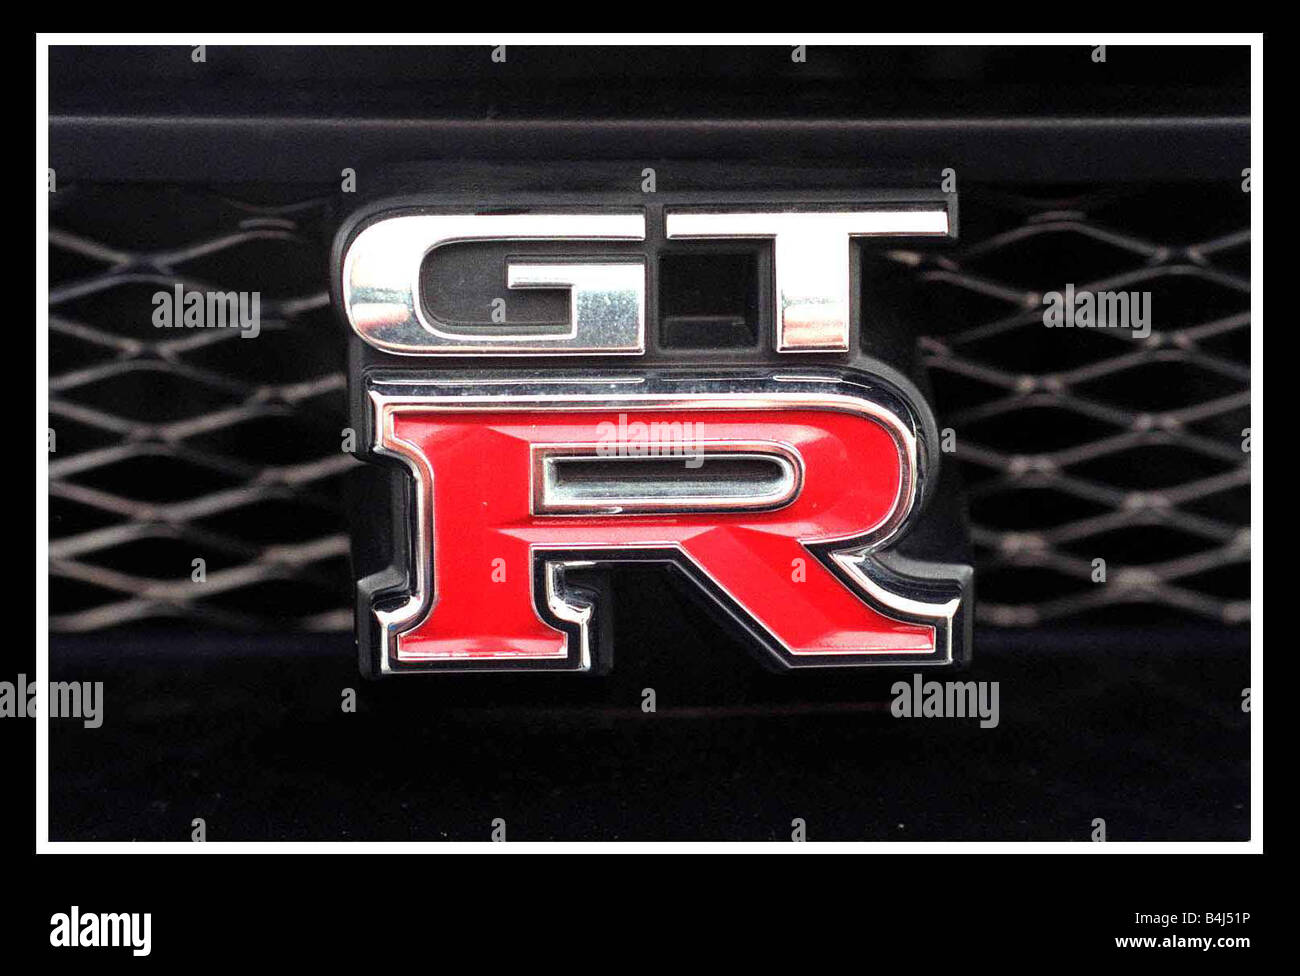 nissan skyline gtr car logo april 2000 stock photo 20068098 alamy